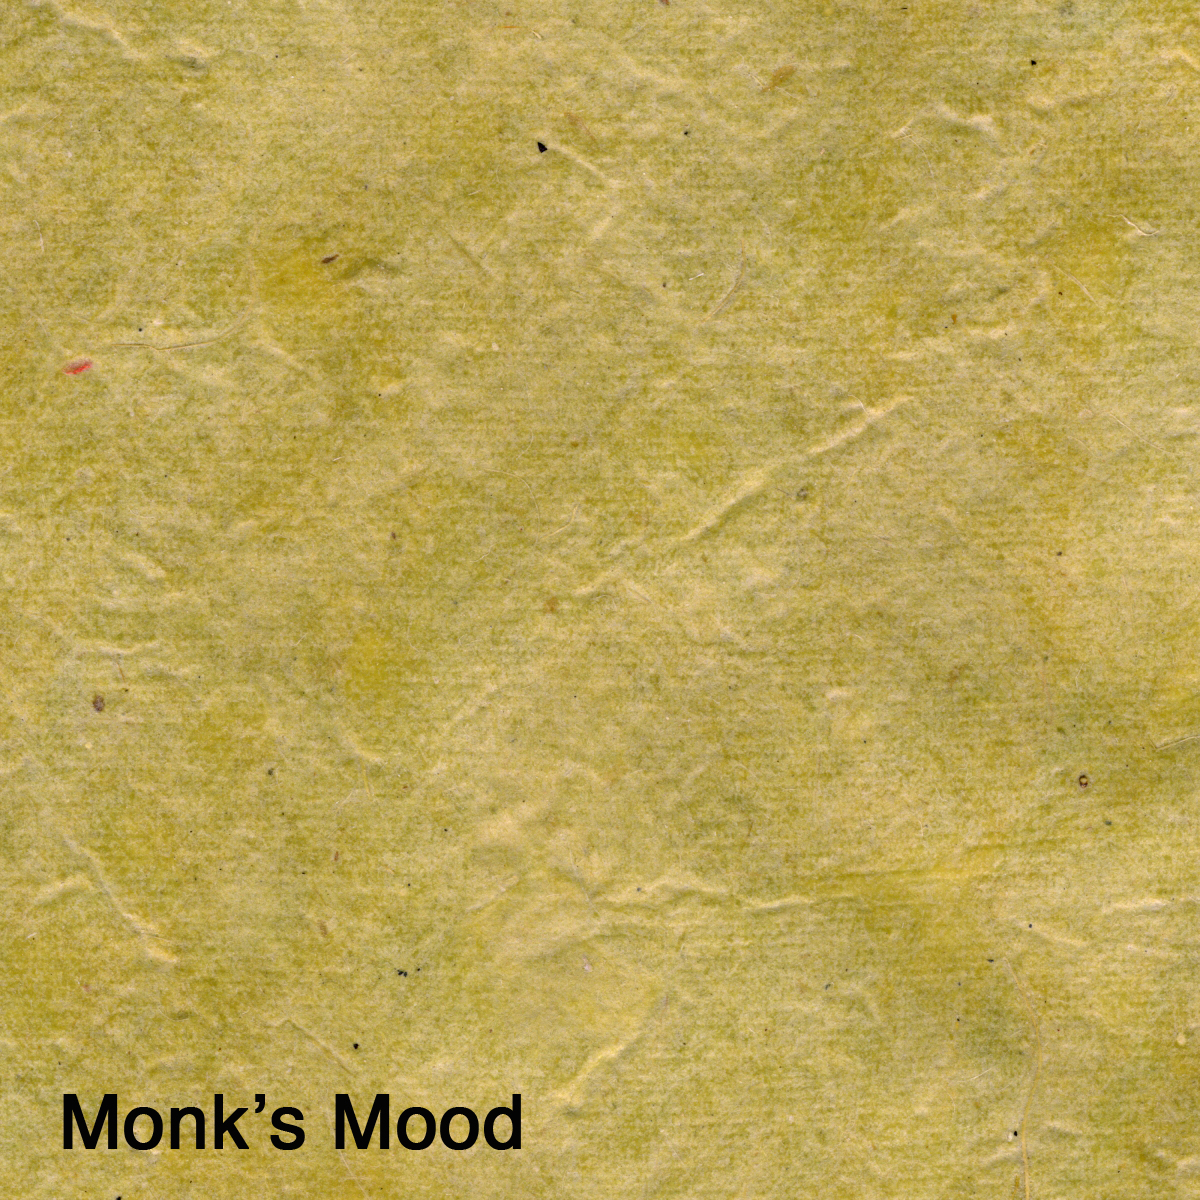 Monk's Mood.jpg